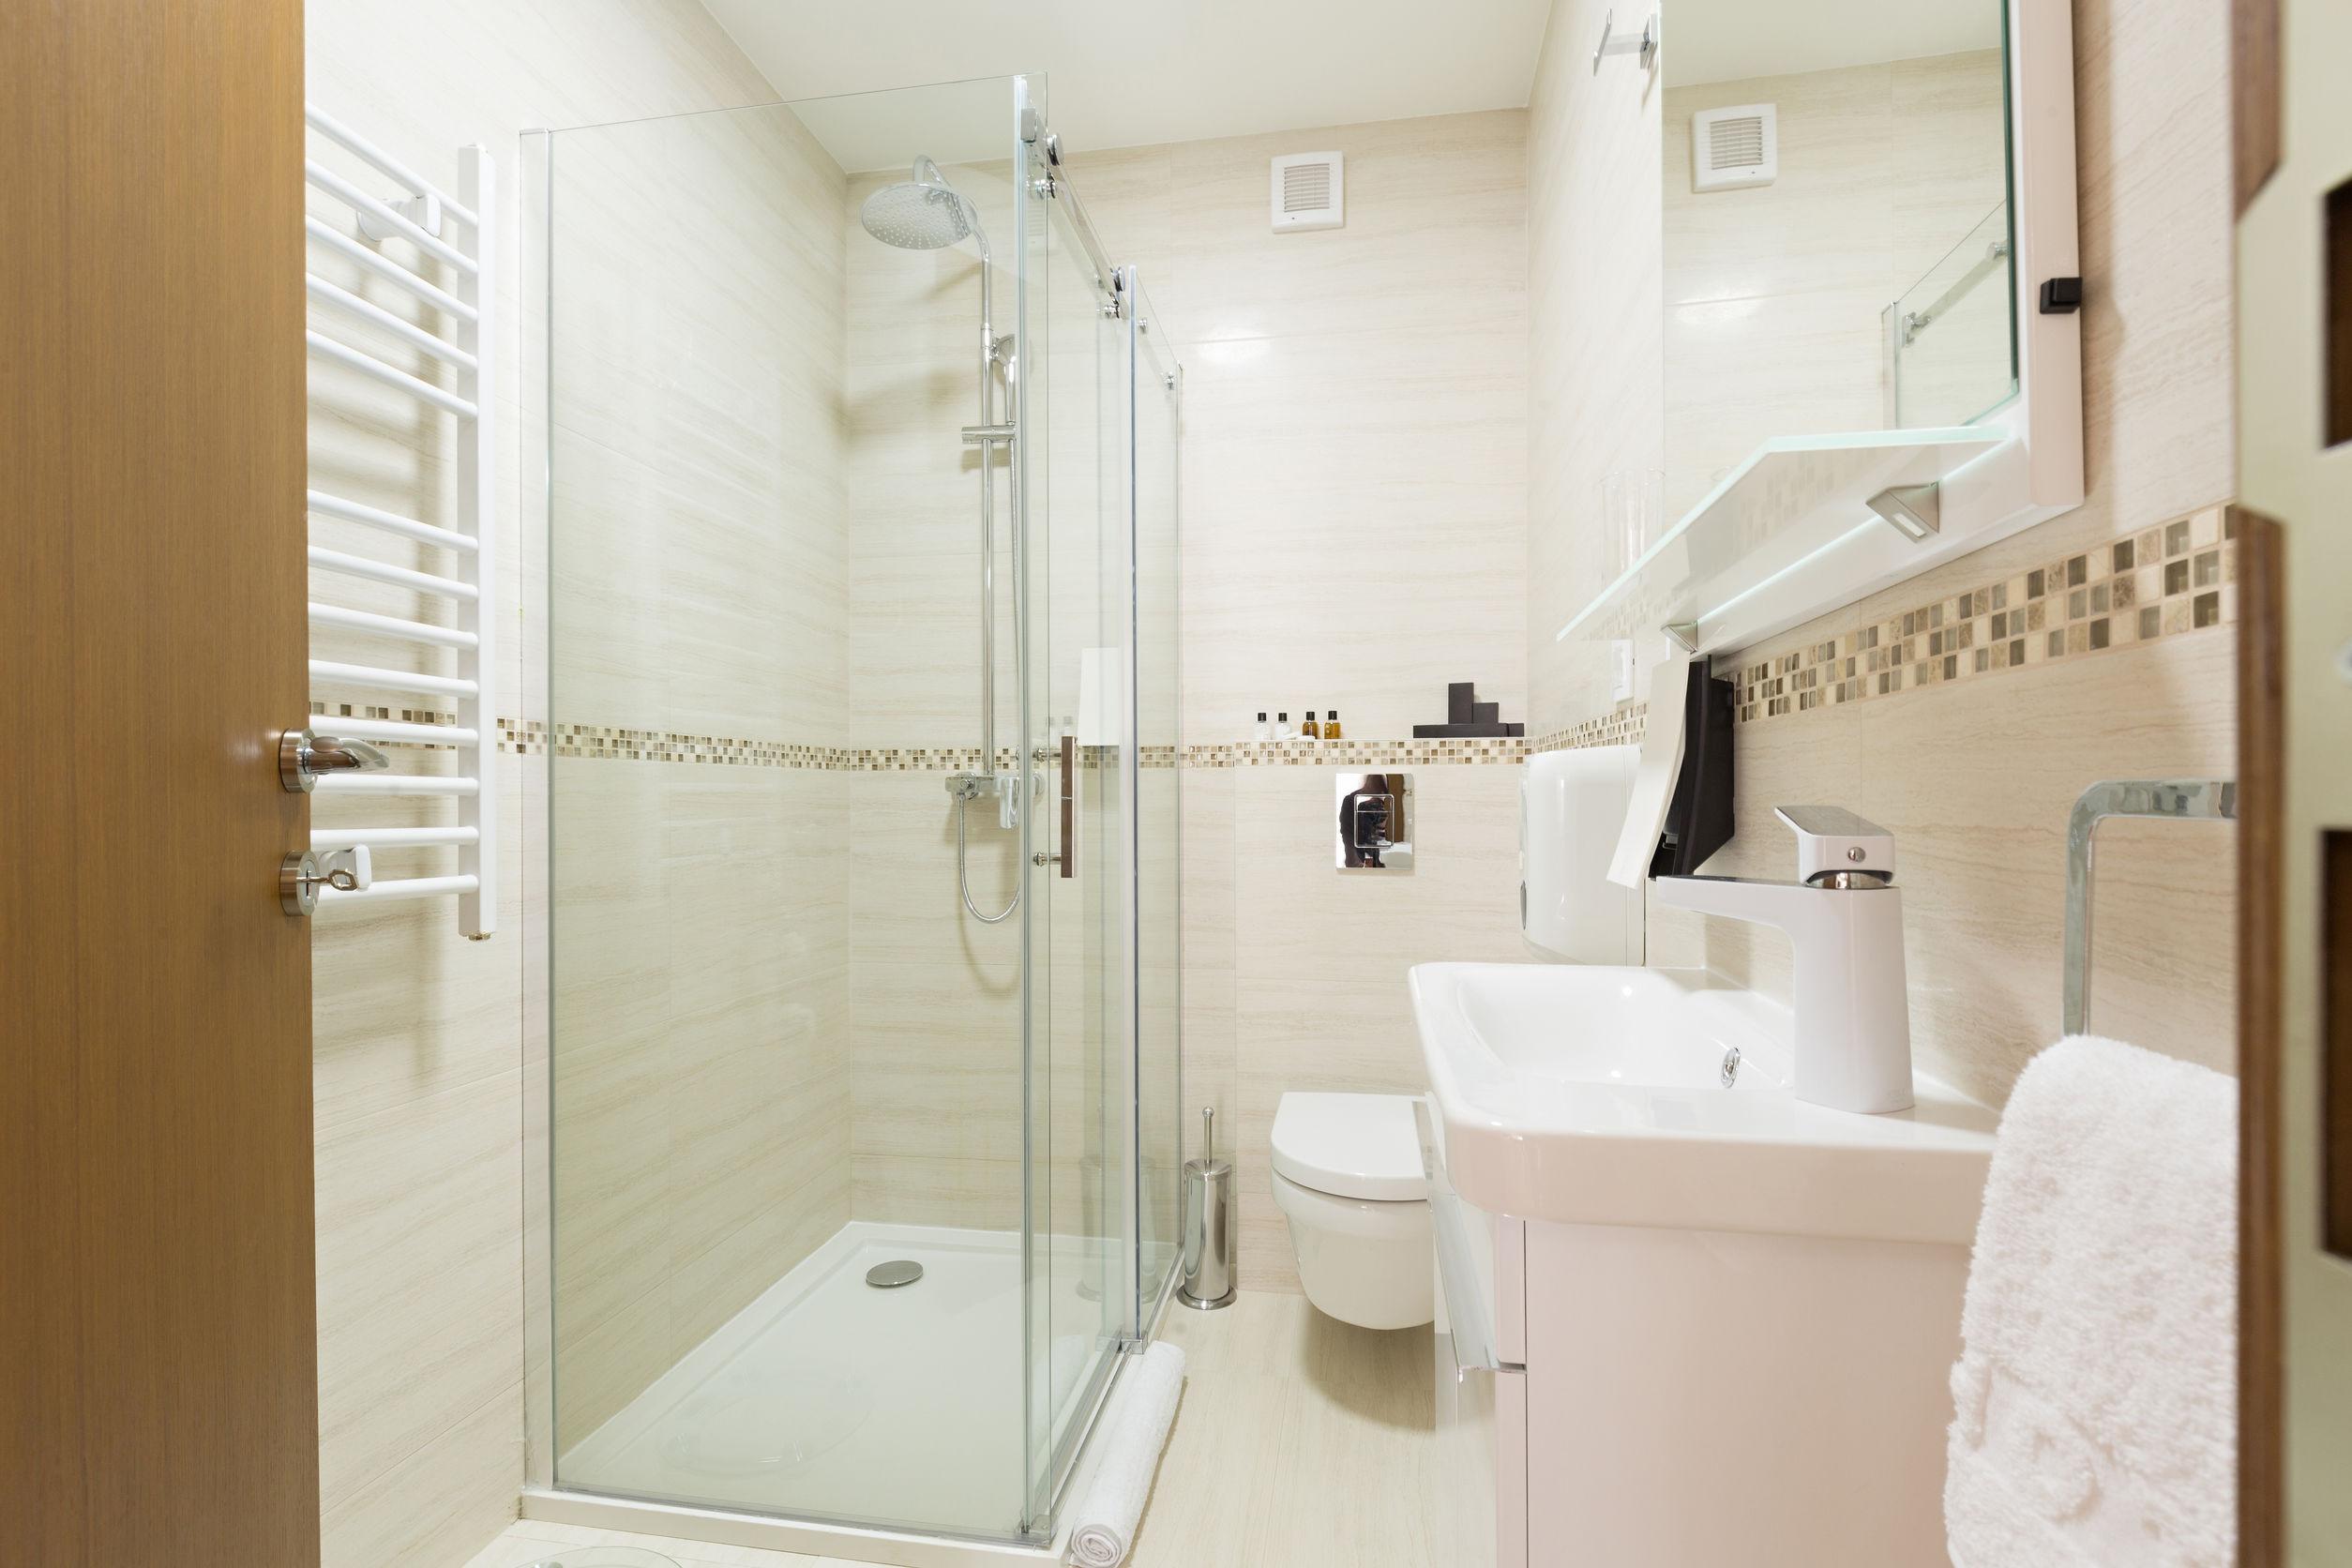 Ricoprire Vasca Da Bagno Prezzi sovrapposizione vasca da bagno torino - trasformazione vasca